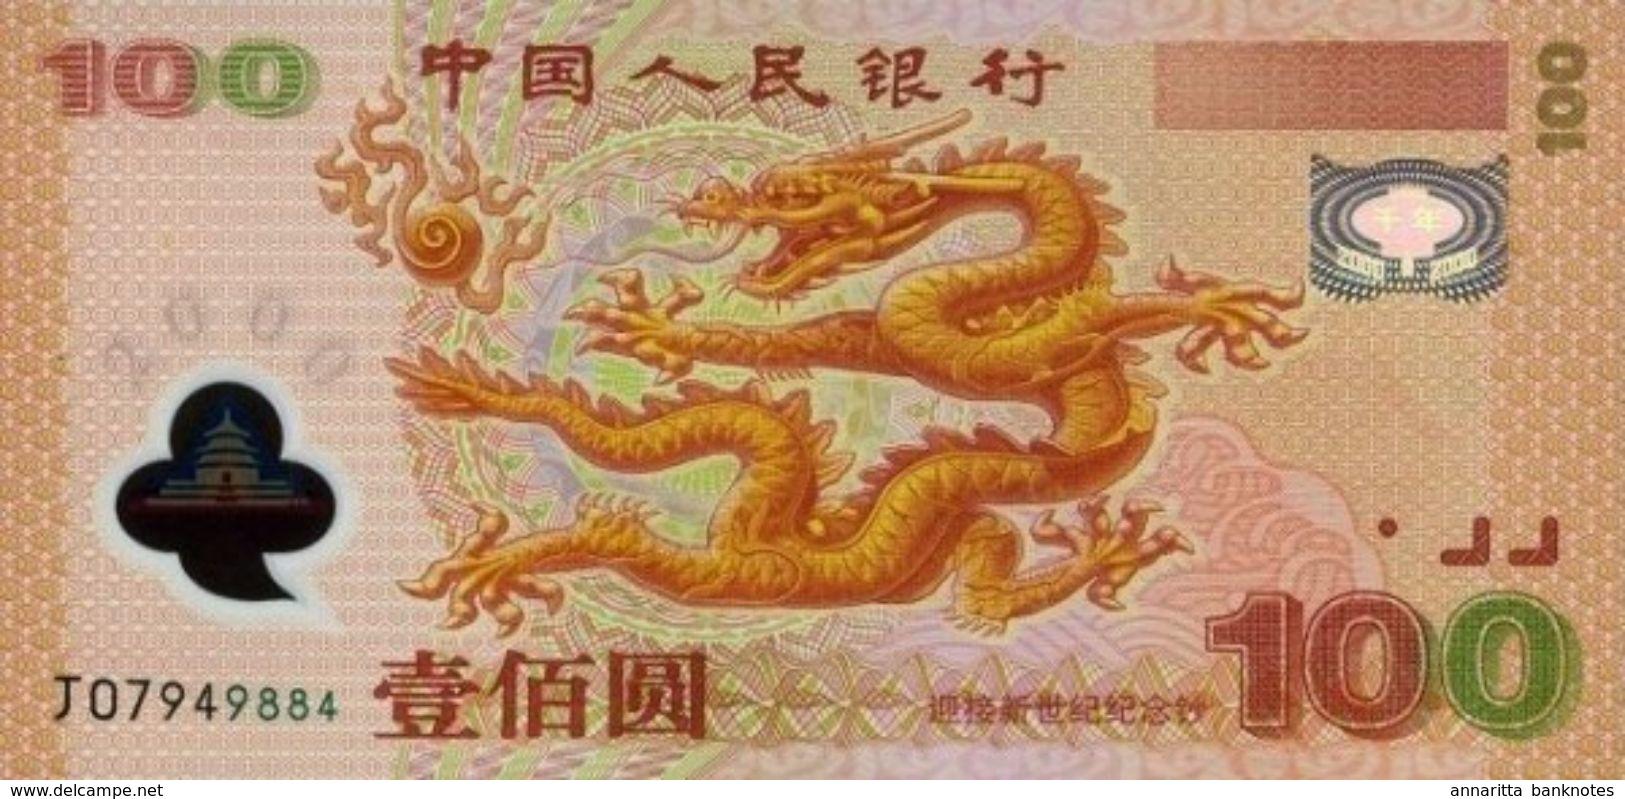 * CHINA 100 YUAN 2000 (1999) P-902 UNC COMMEMORATIVE, RARE [CN4115a] - China